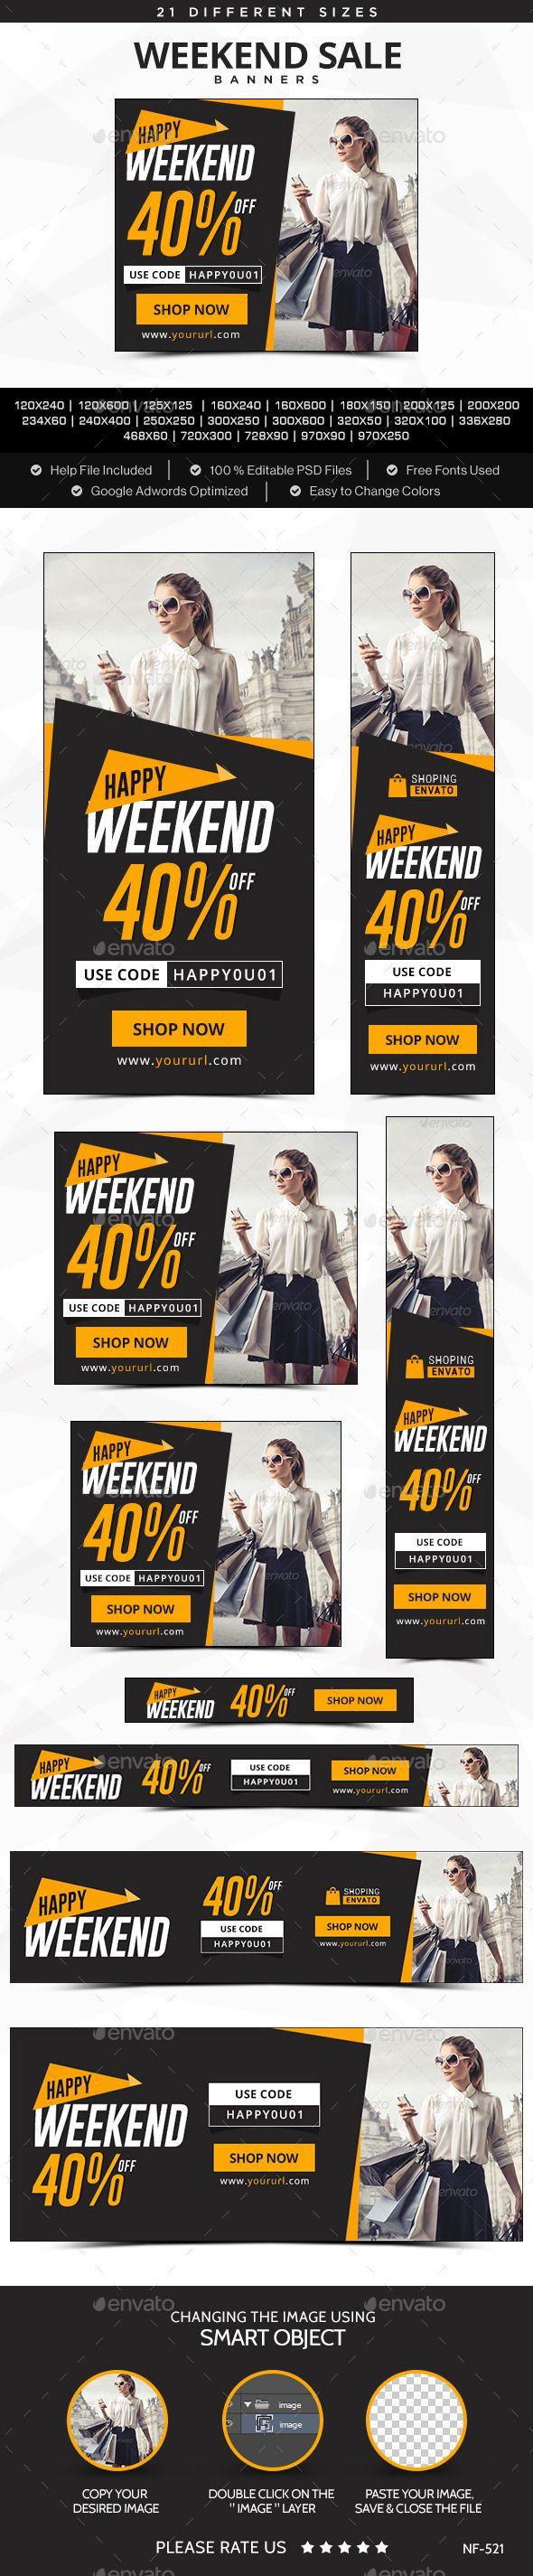 Weekend Sale Banners Template #design Download: http://graphicriver.net/item/weekend-sale-banners/12213956?ref=ksioks